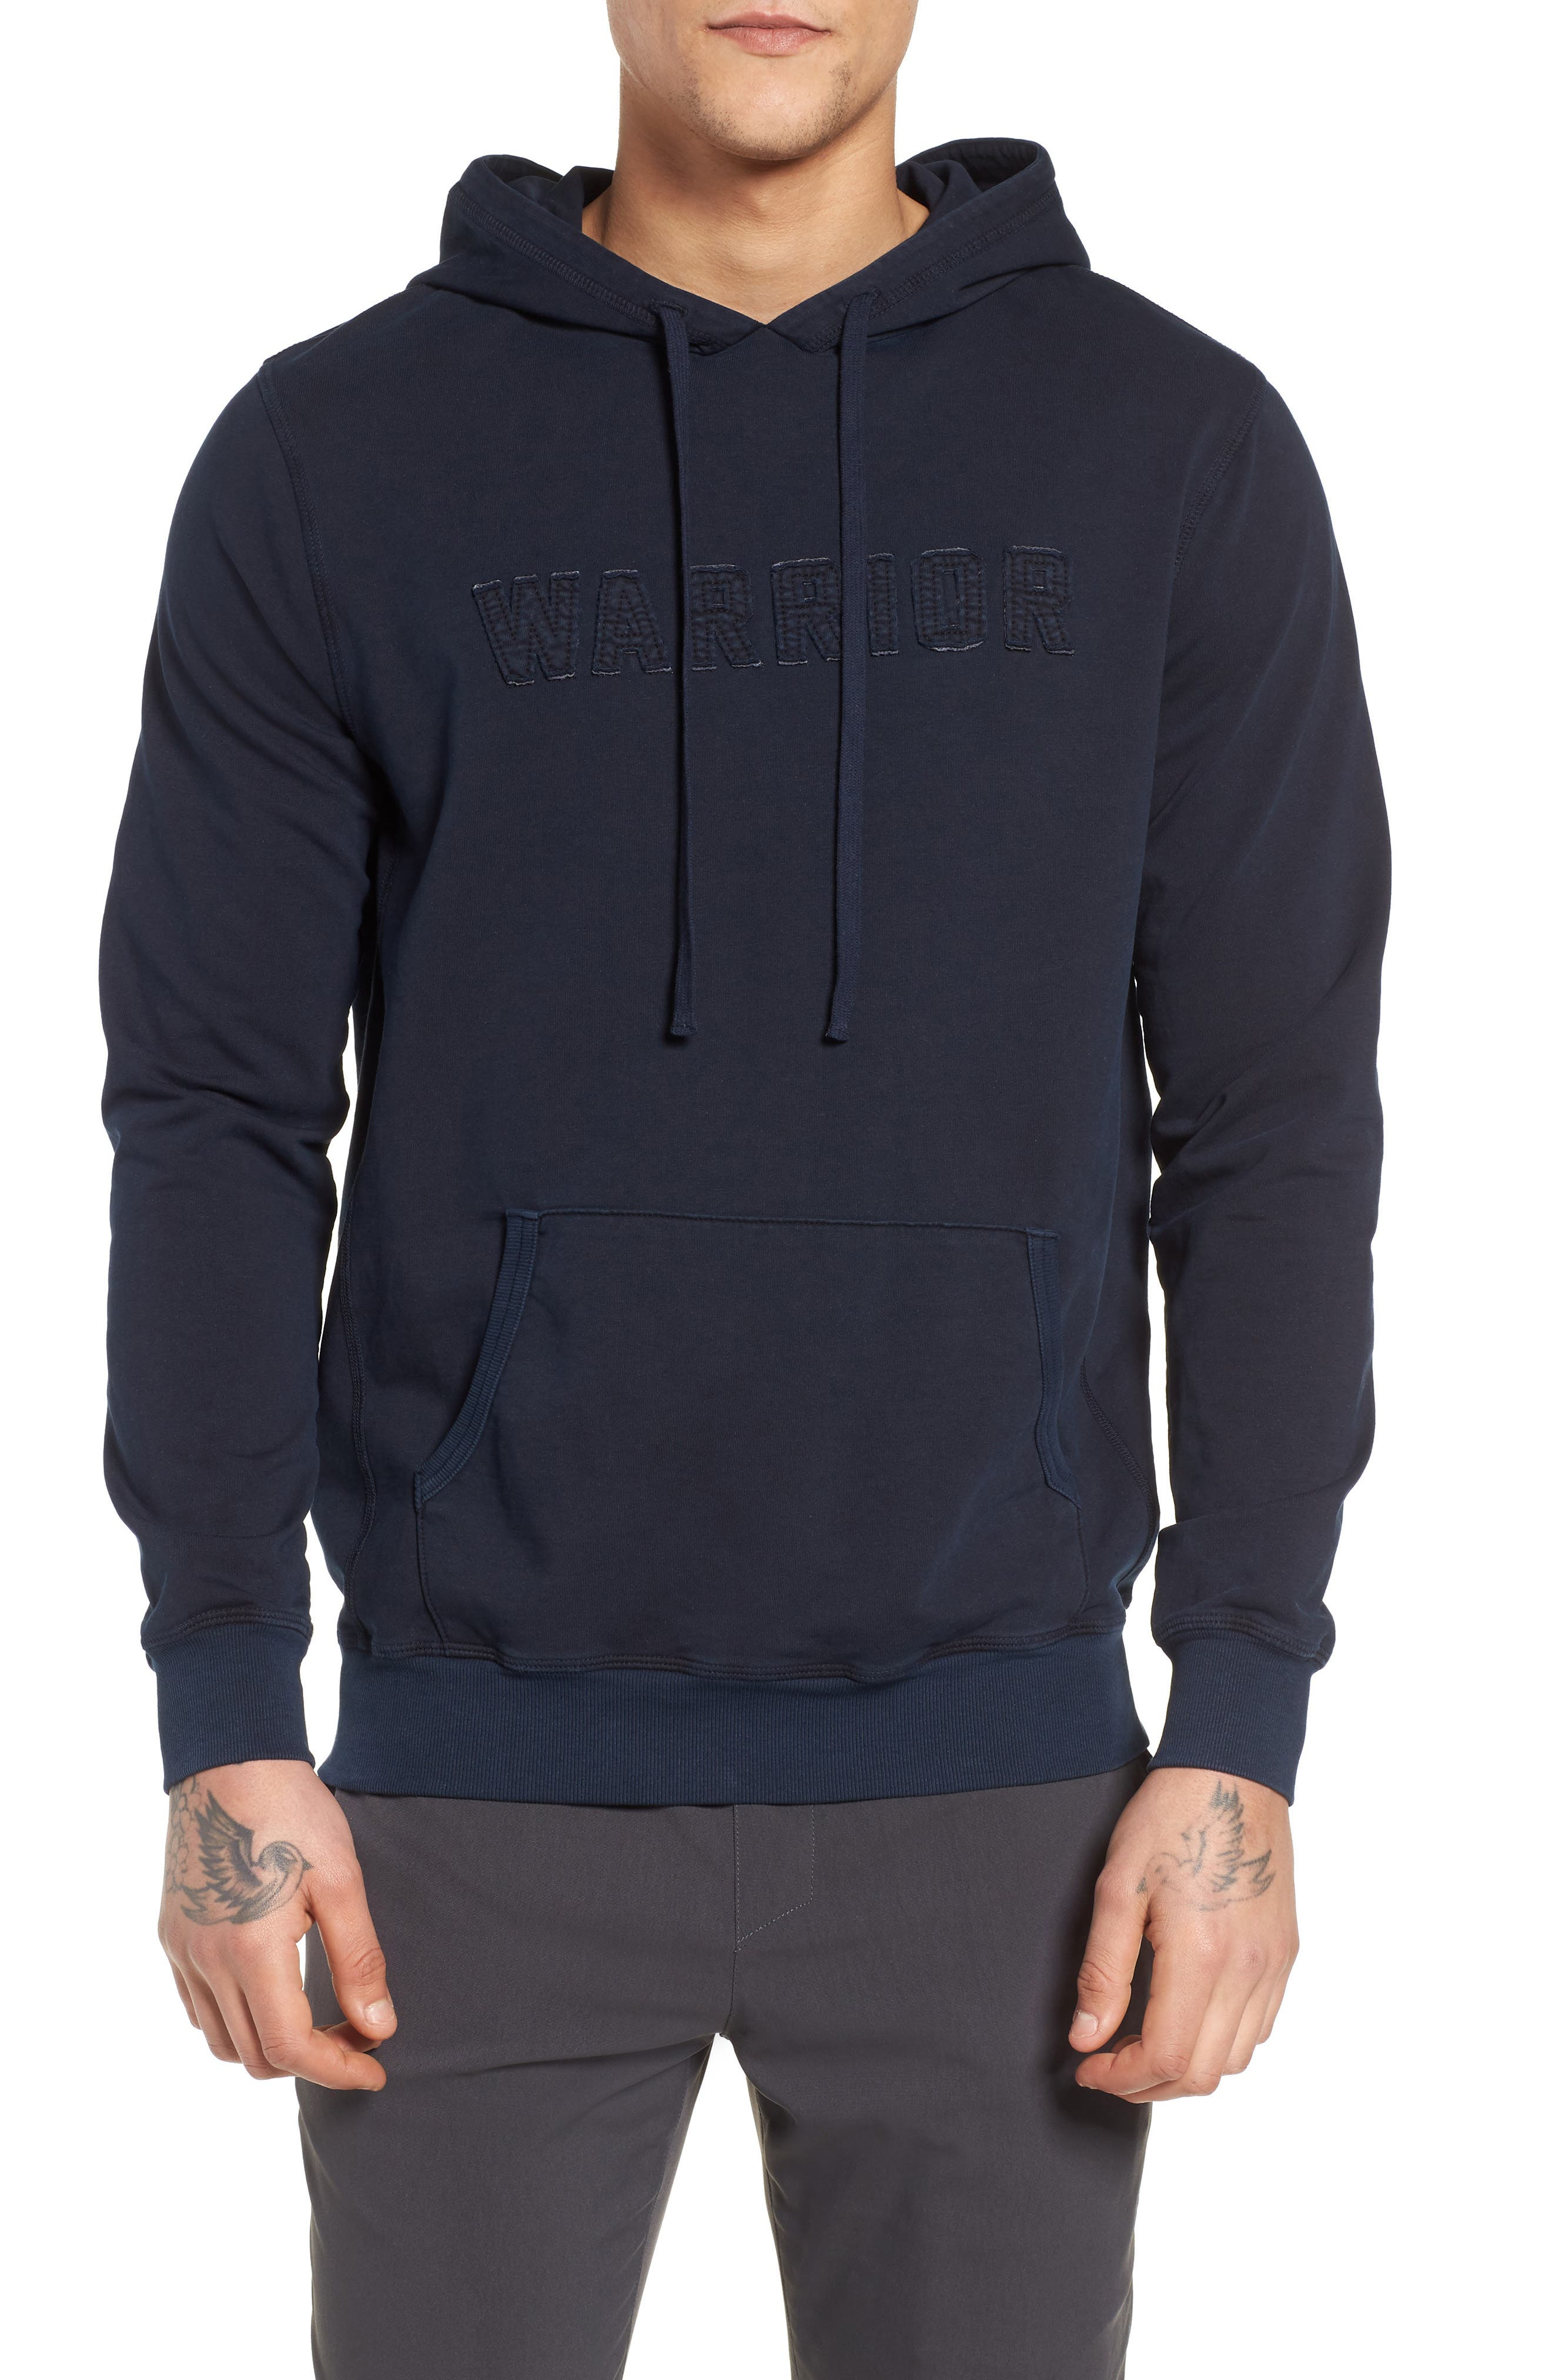 S.O.M. Hoodie Sweatshirt,                         Main,                         color, 410